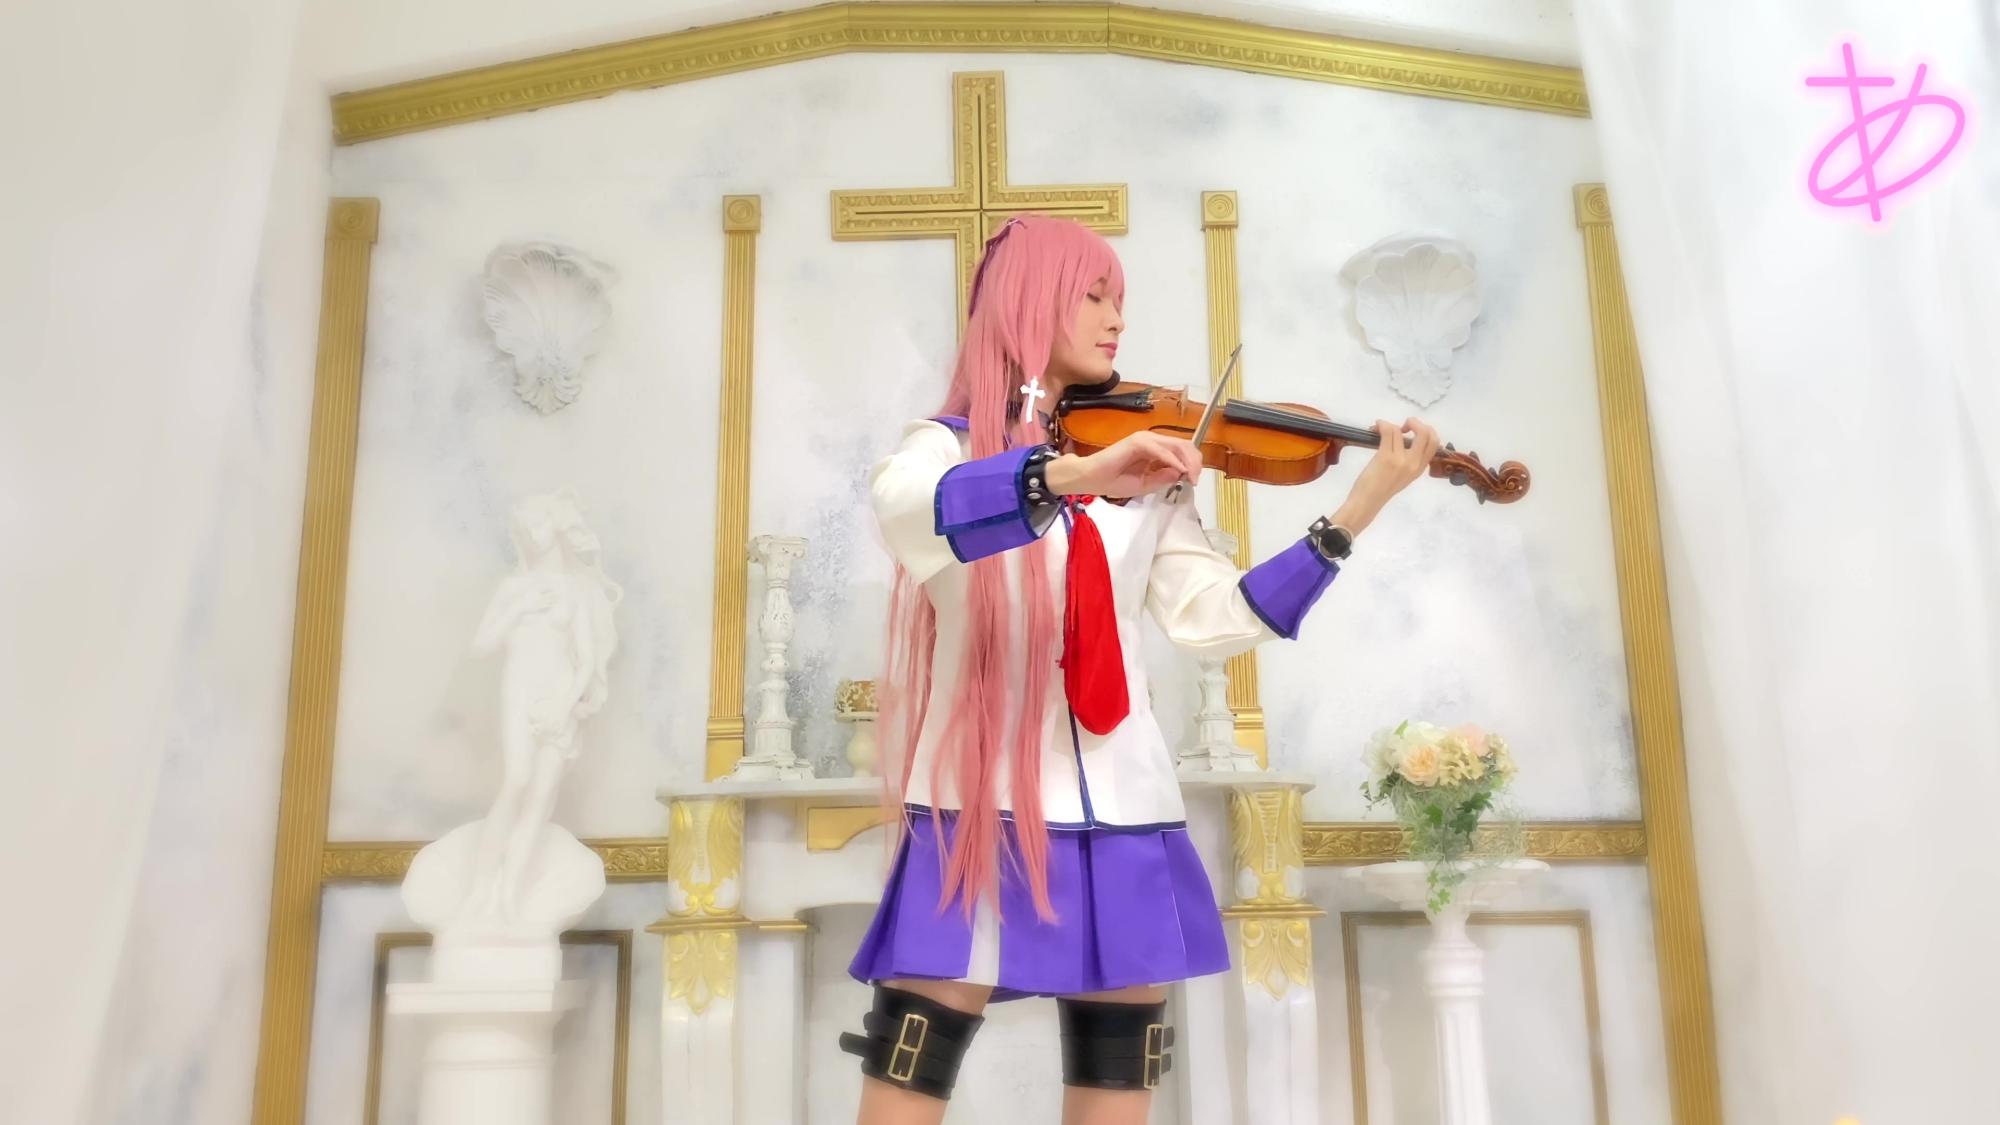 【Ayasa】Angel Beats!《一番の宝物》(LiSA)